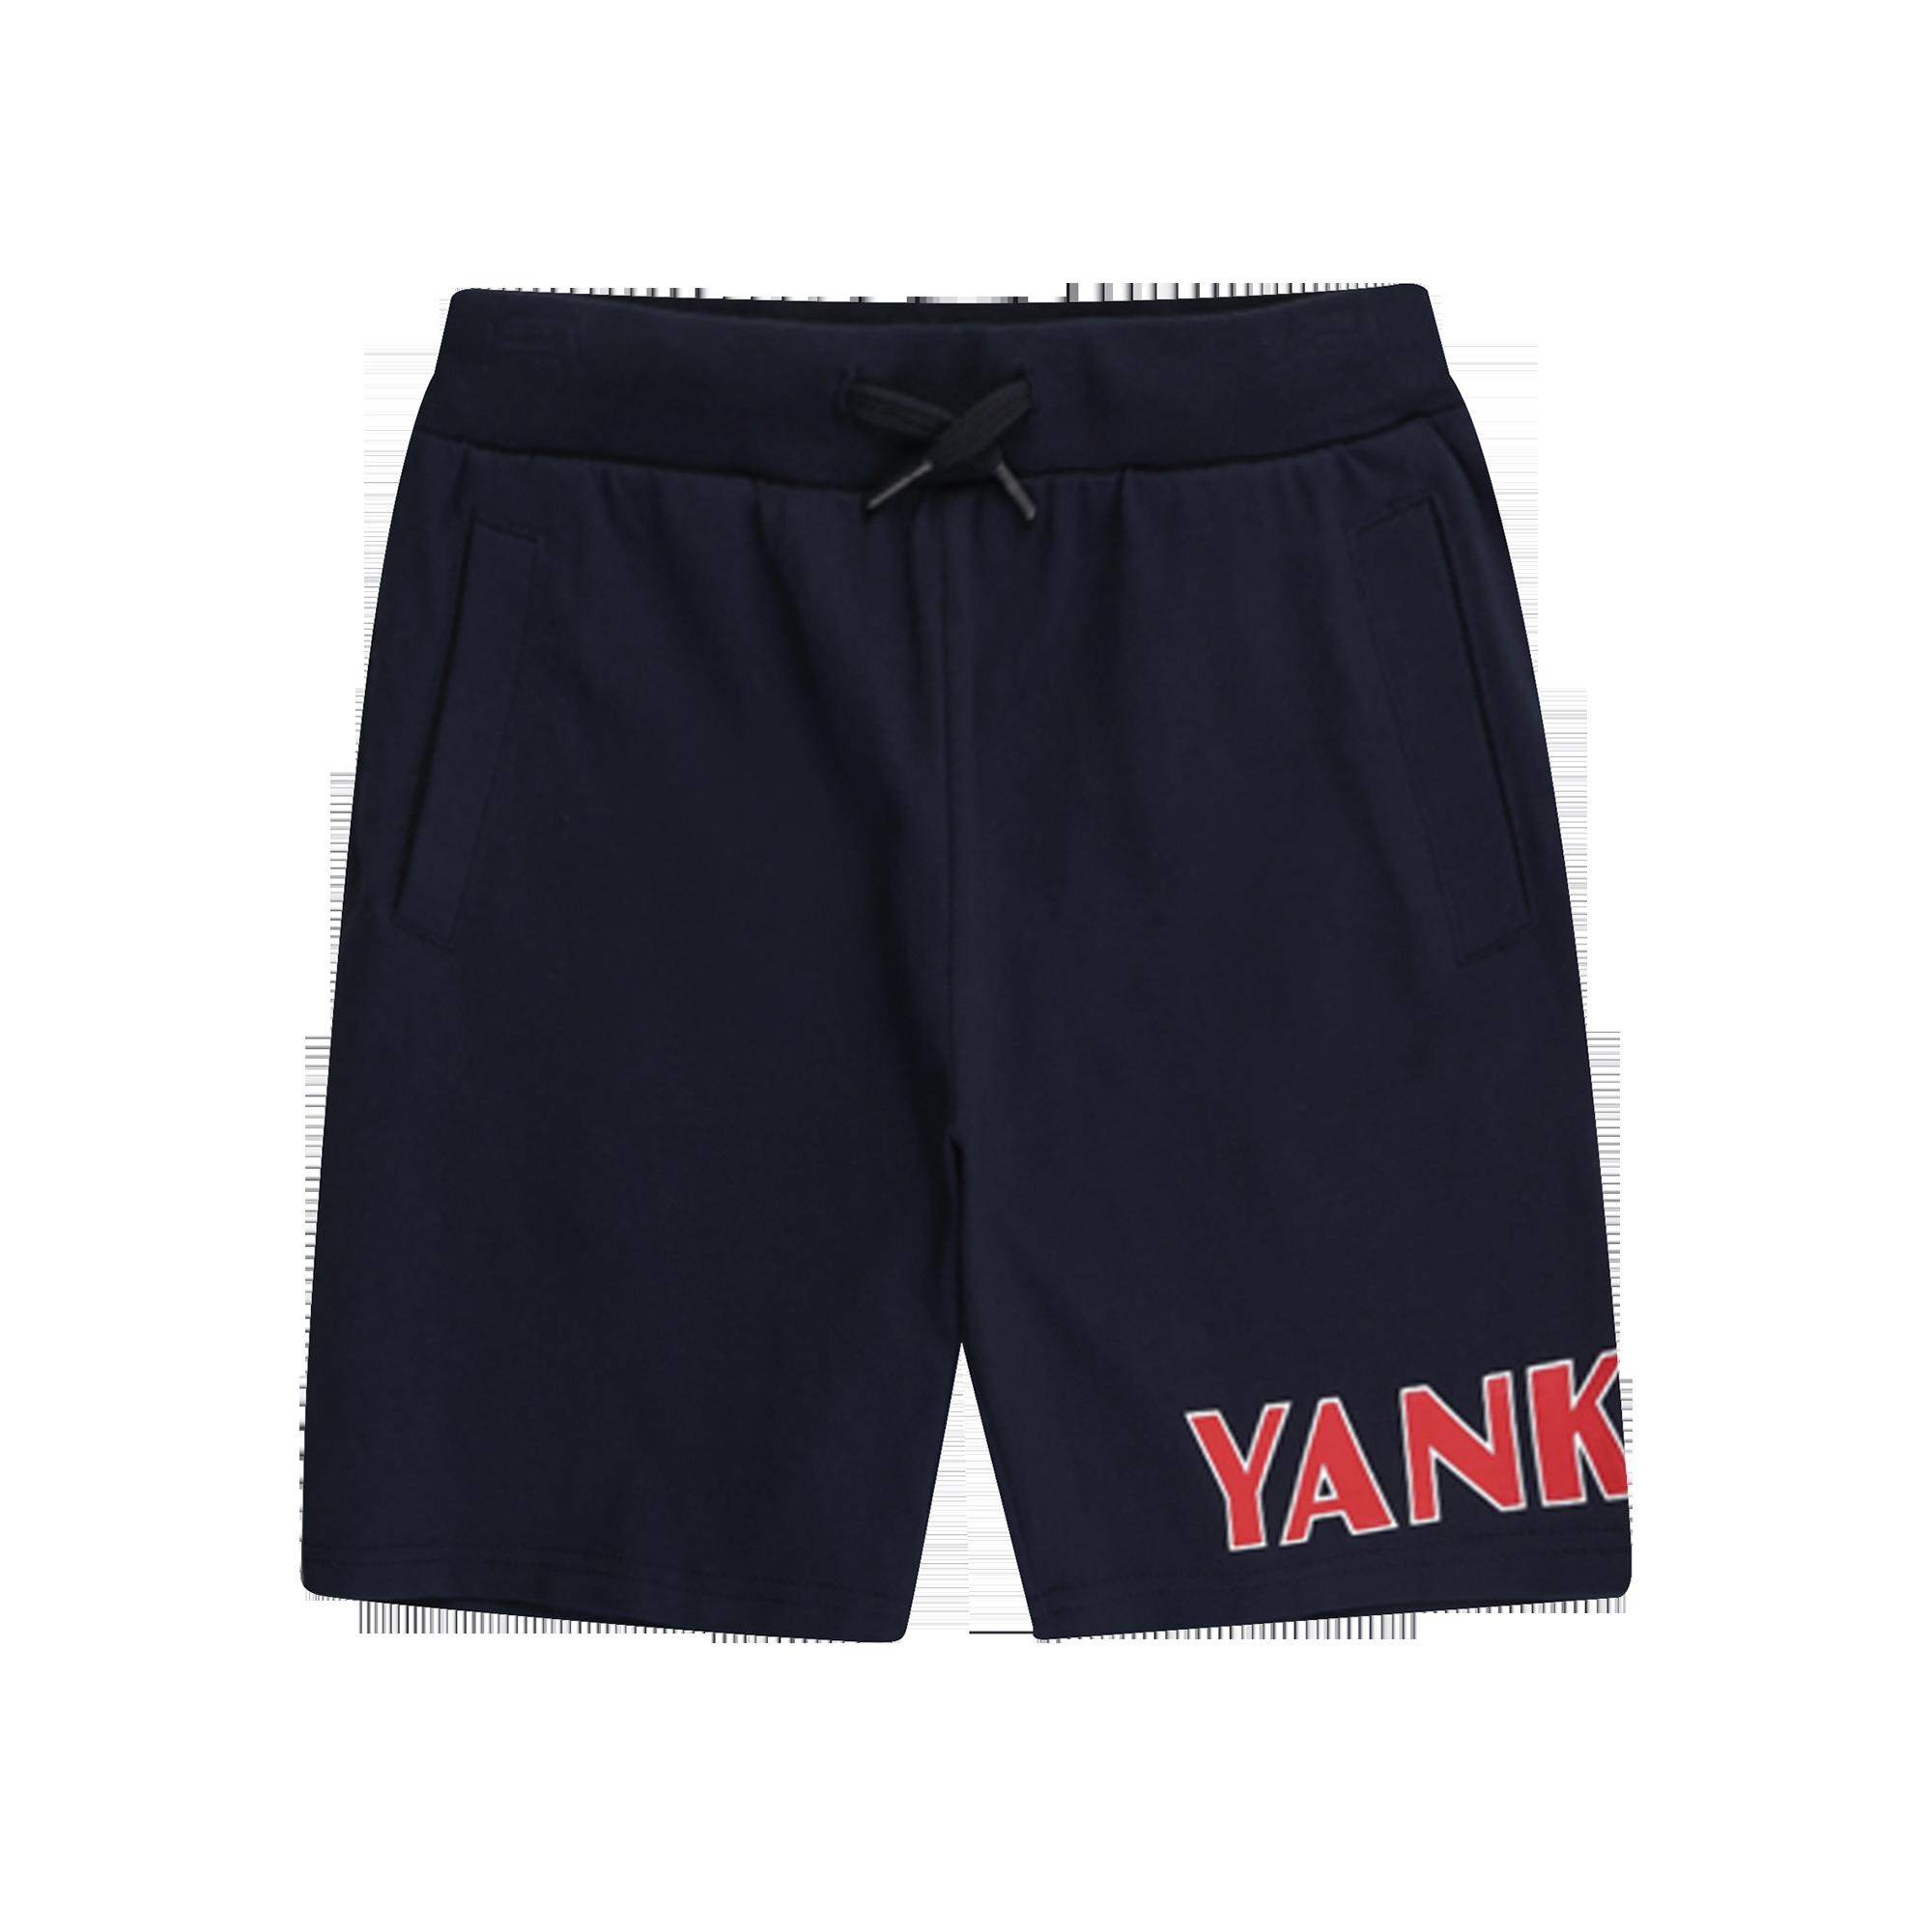 NEW YORK YANKEES UNISEX WORDING LOGO KNEE LENGTH PANTS